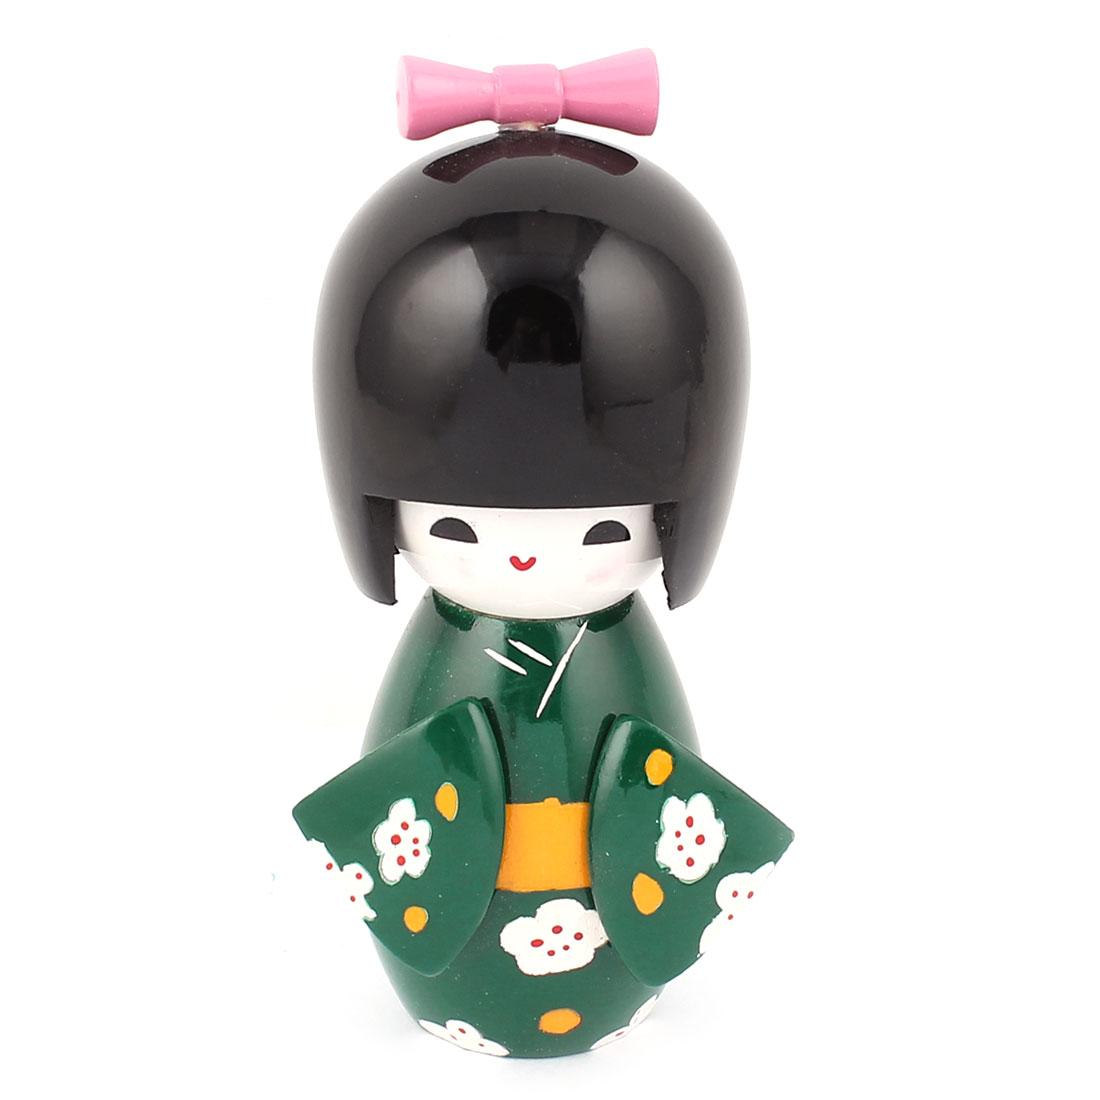 Manual Floral Decor Kimono Wooden Craft Gift Japanese Kokeshi Doll Green